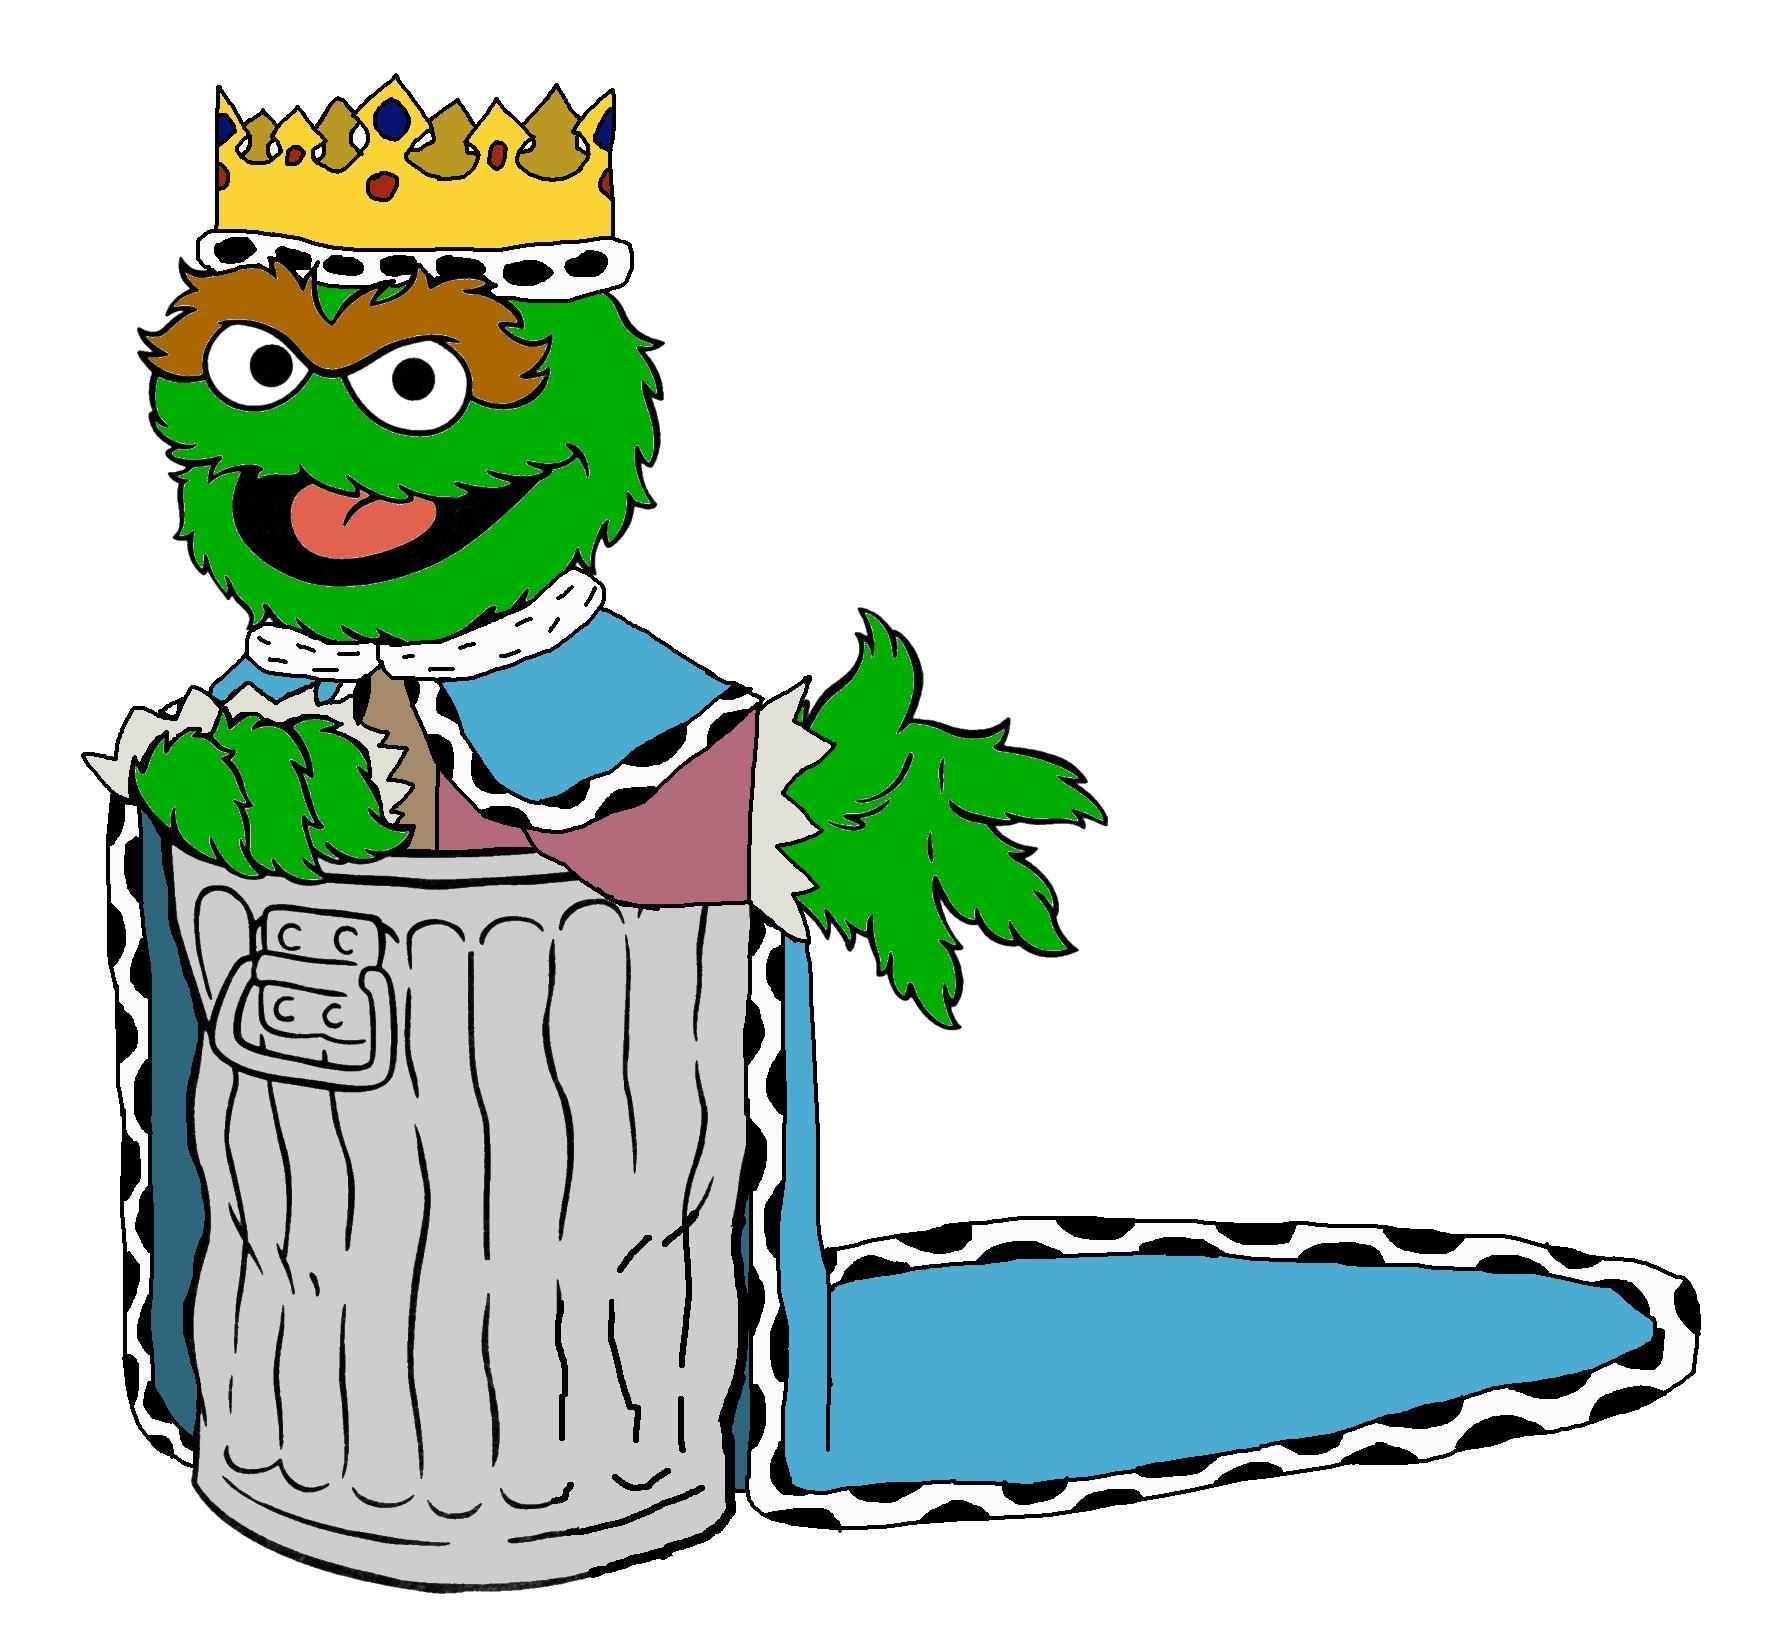 Sesame street prince oscar